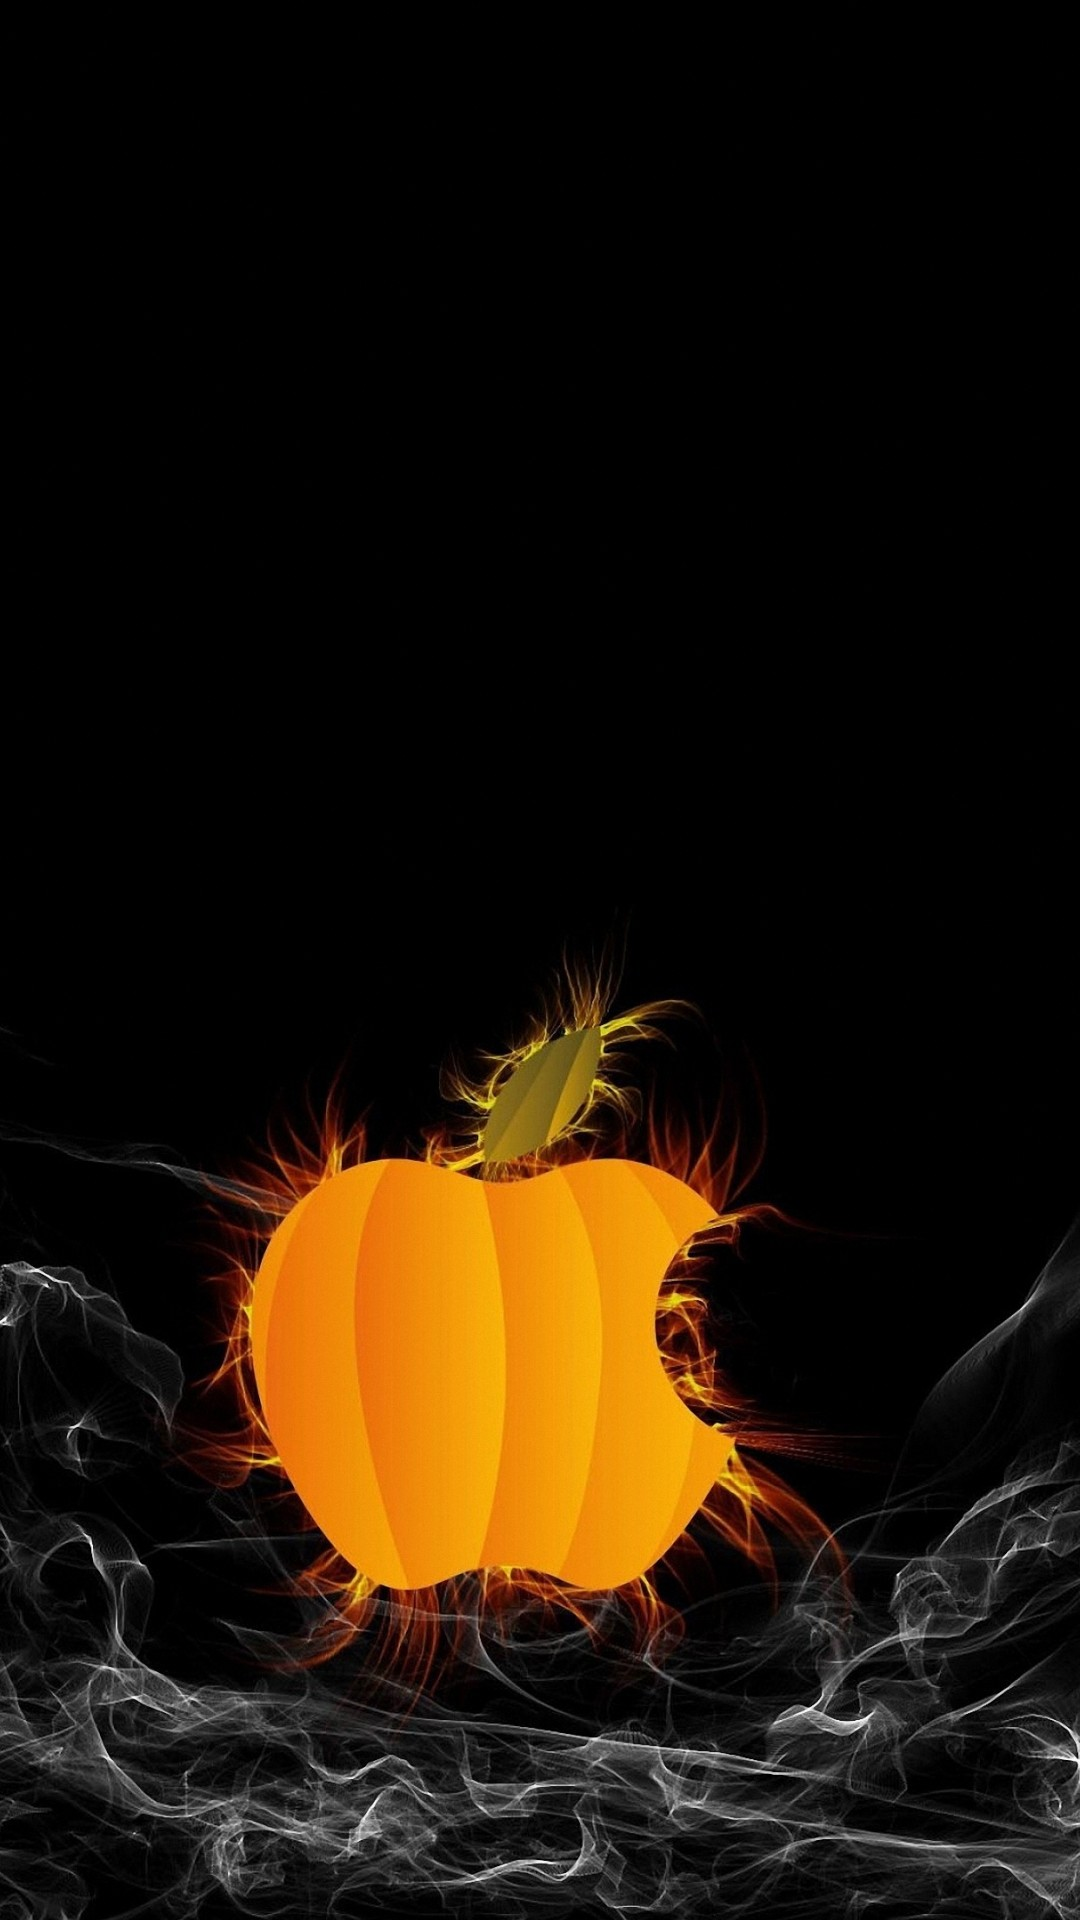 Cute Halloween Phone Wallpaper 64 Images